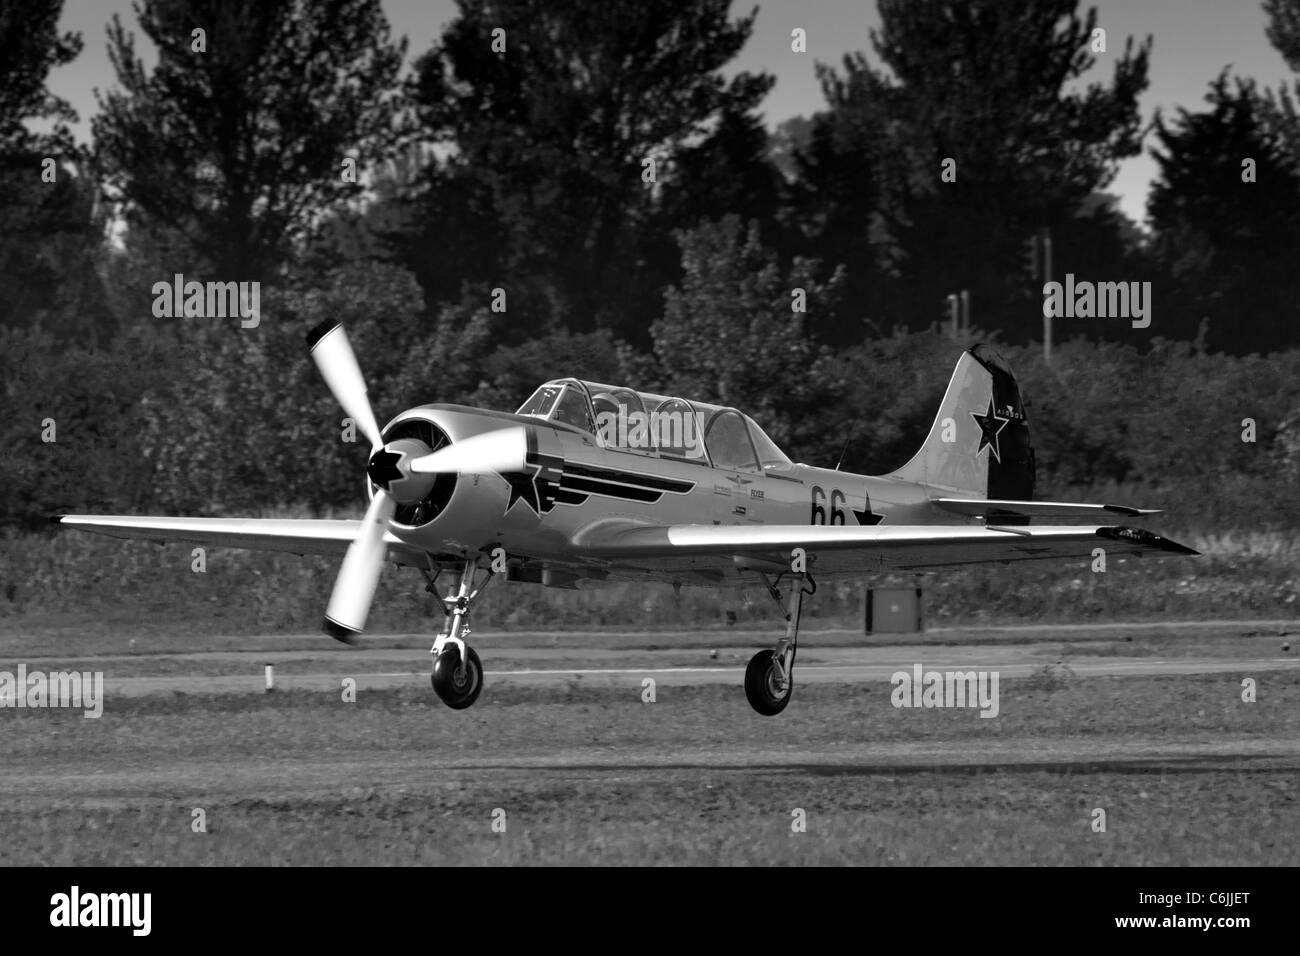 A Yakovlev aerobatic aeroplane landing at Shoreham airfield in 2011 - Stock Image